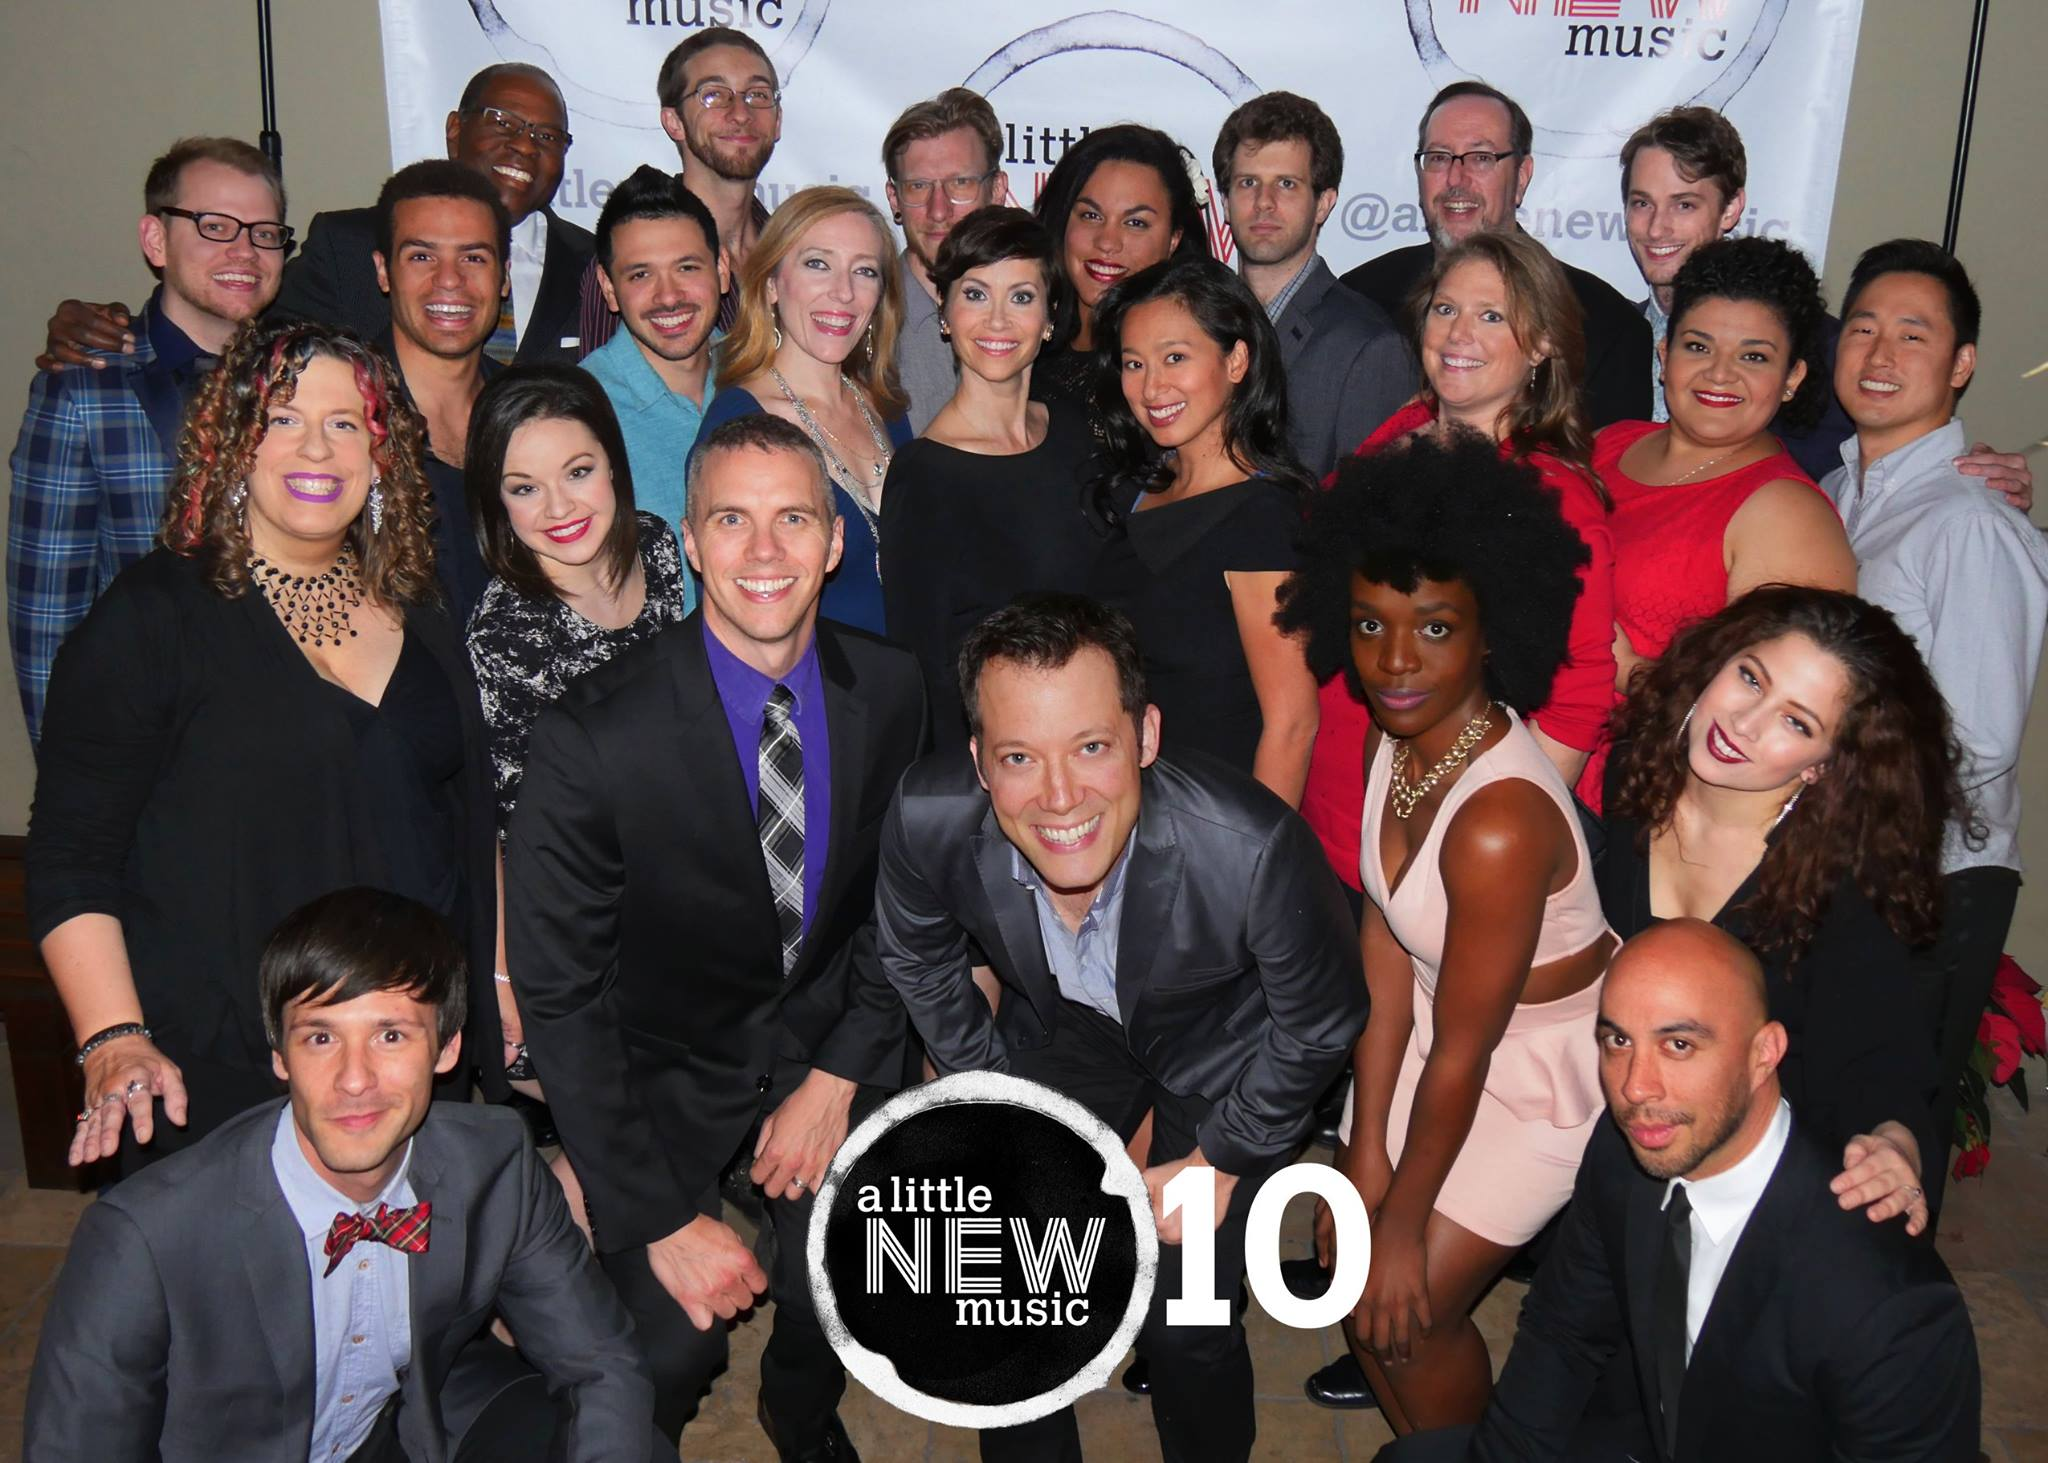 ALNM 10 Cast Photo